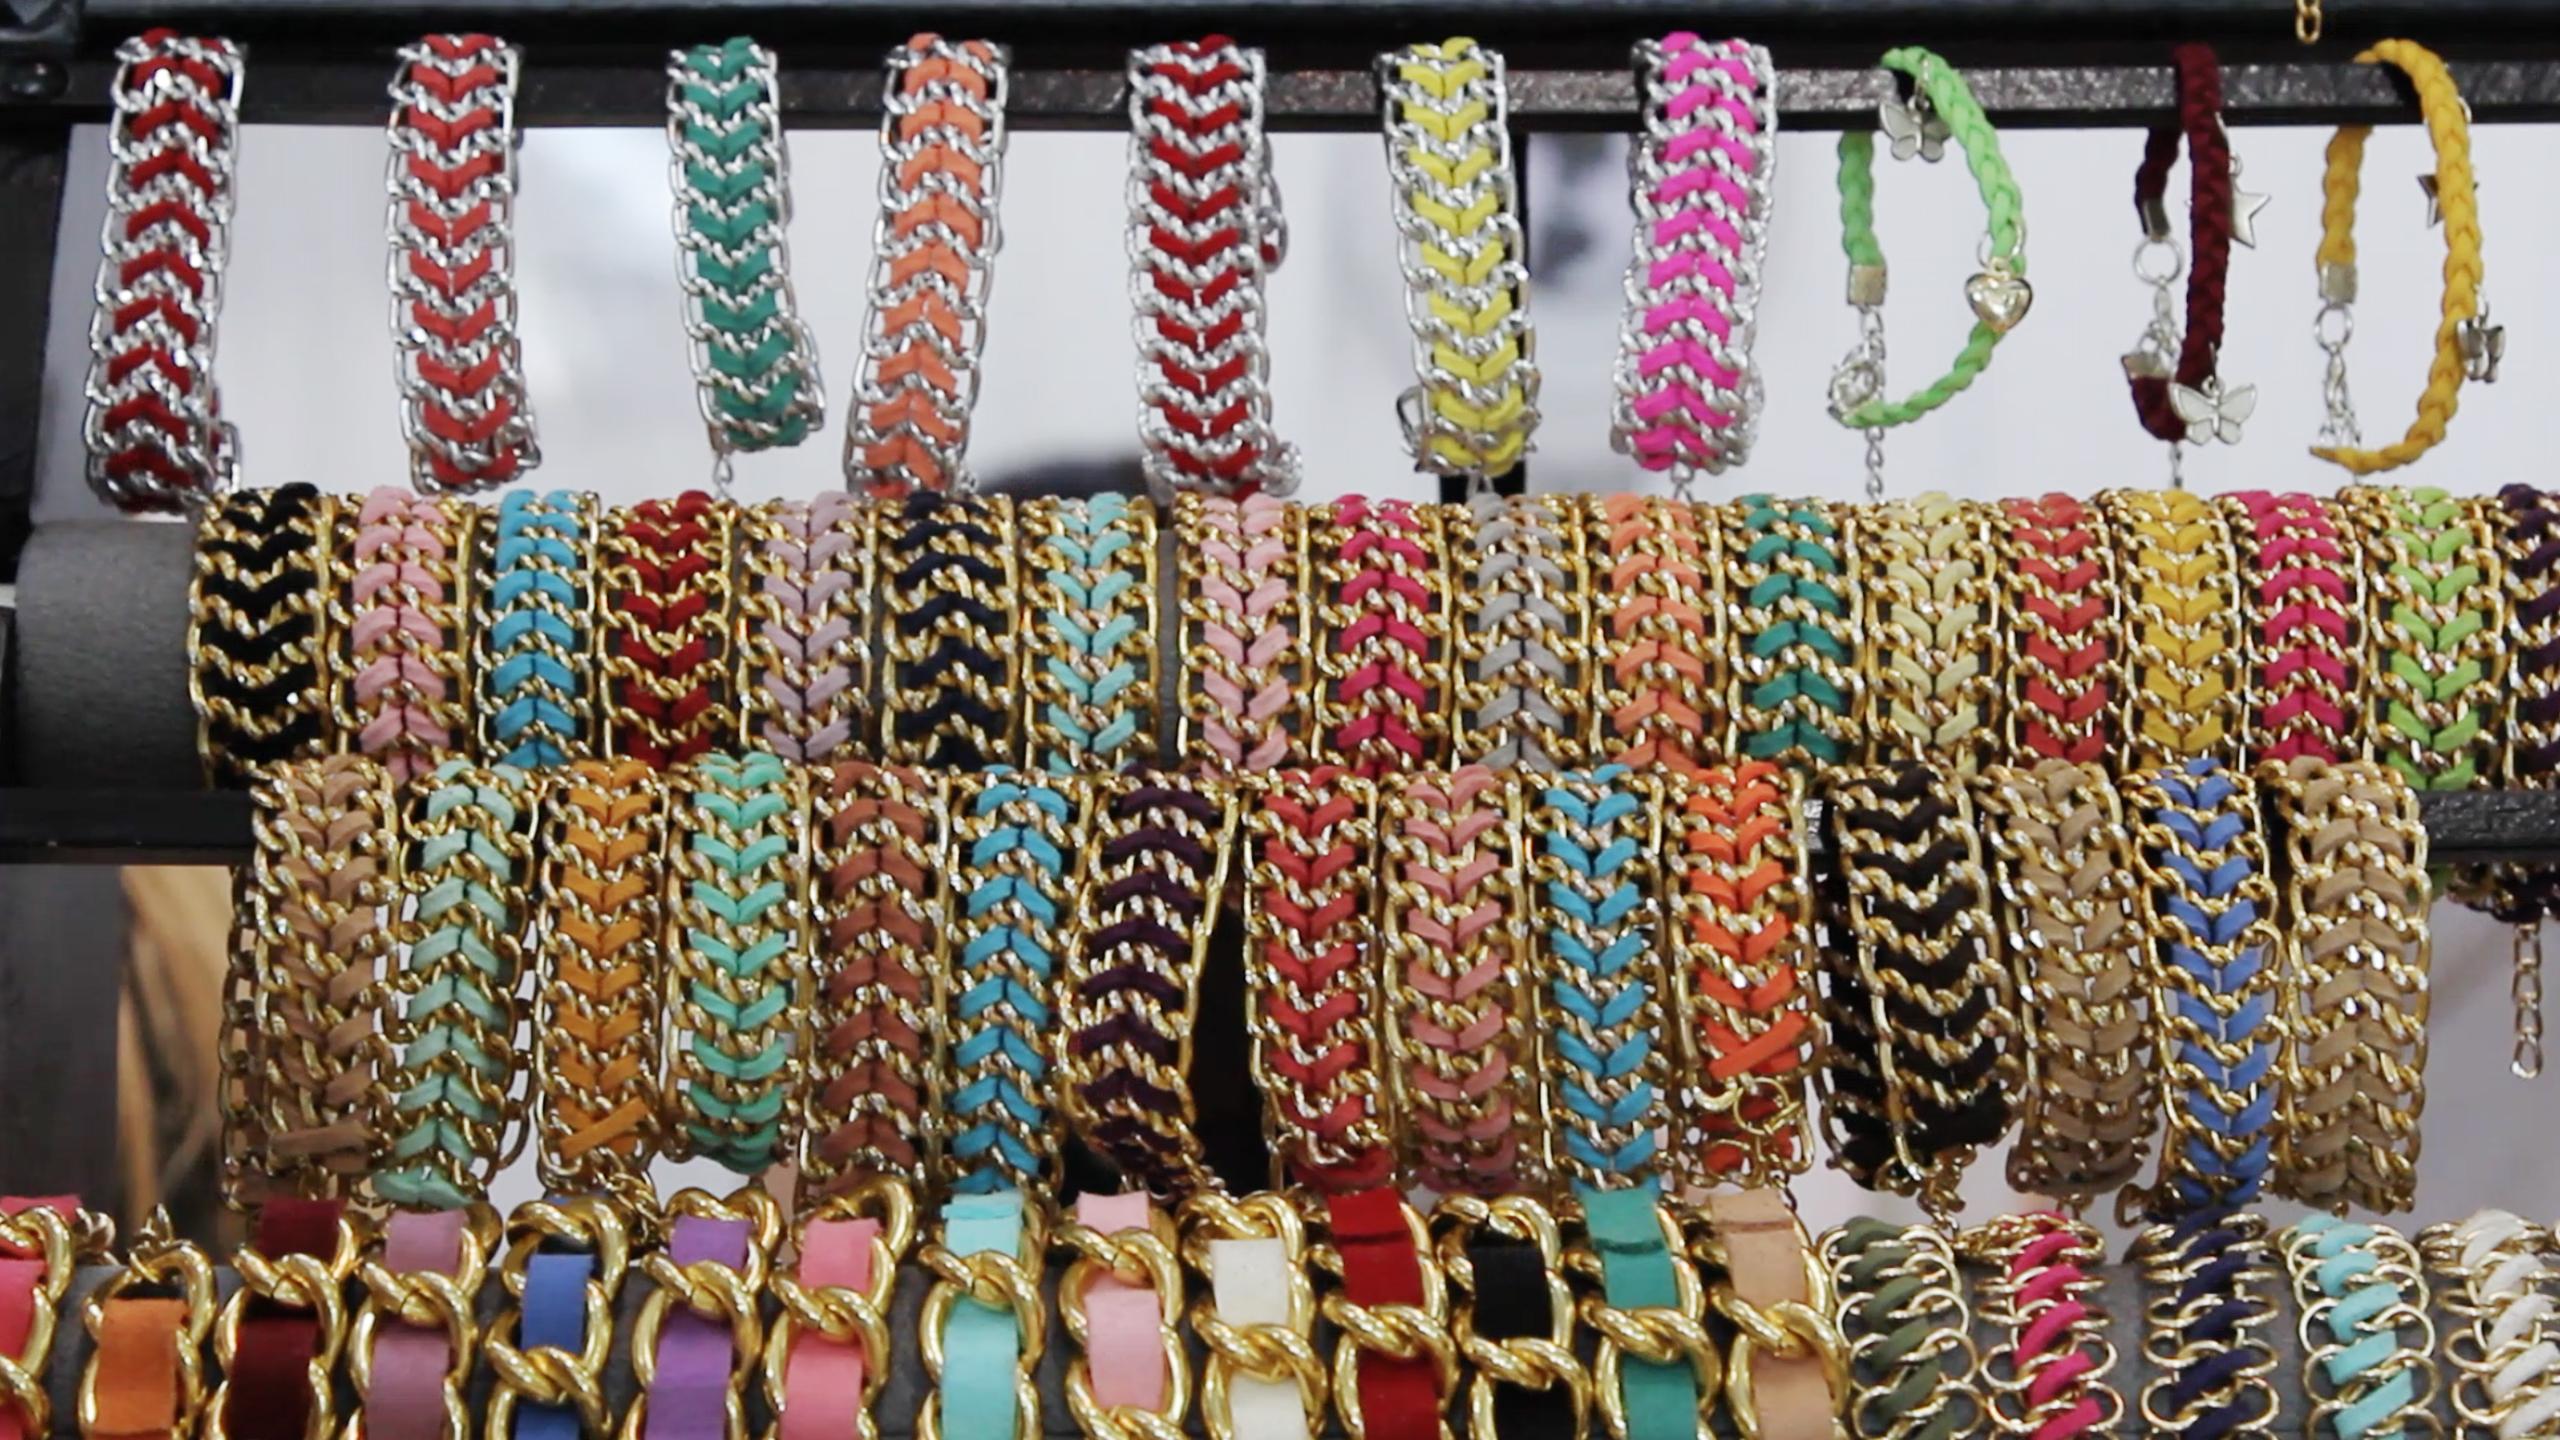 544 Unikatni nakit domaćih brendova: WaWaWoom Design, Pinkiebella, Lola i Minizucchini